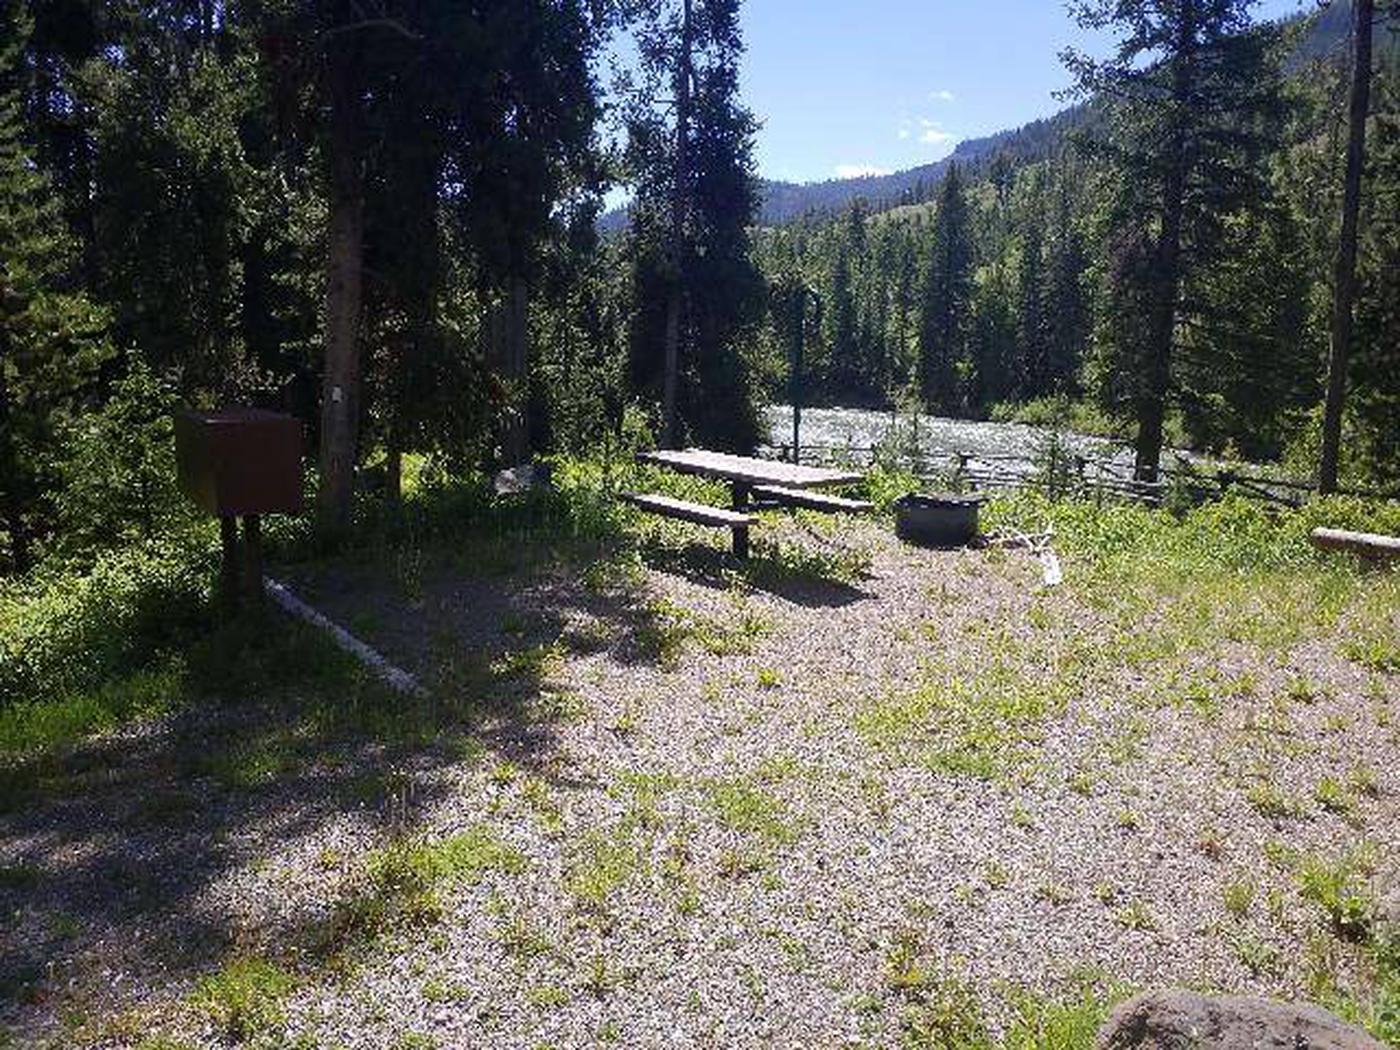 Threemile Campground Campsite 16 - Picnic Area and Rive View